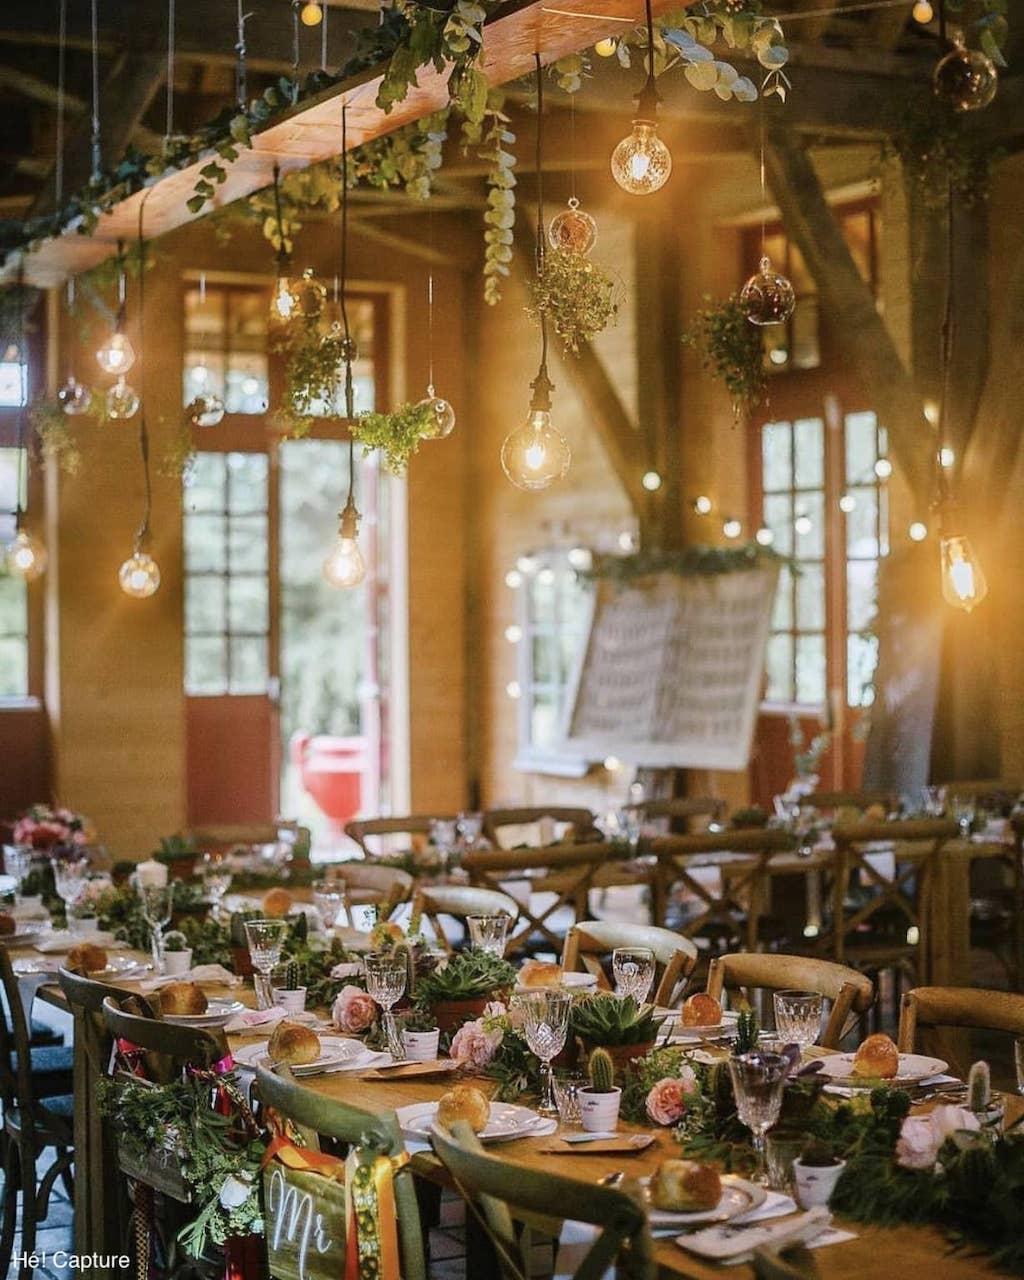 lieu-reception-campagne-champetre-ete-mariage